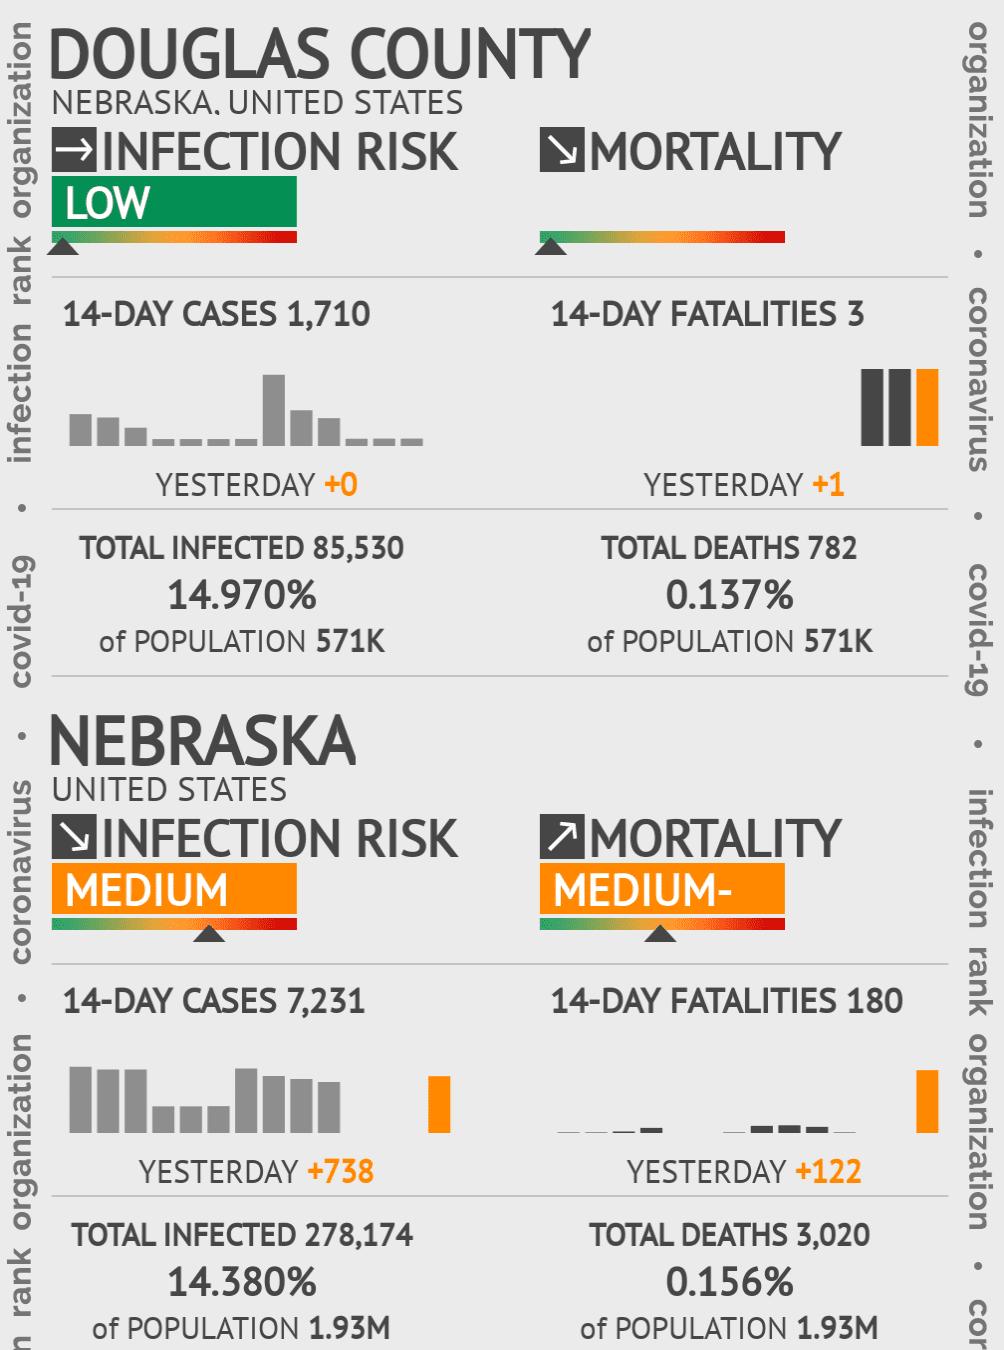 Douglas County Coronavirus Covid-19 Risk of Infection on July 24, 2021